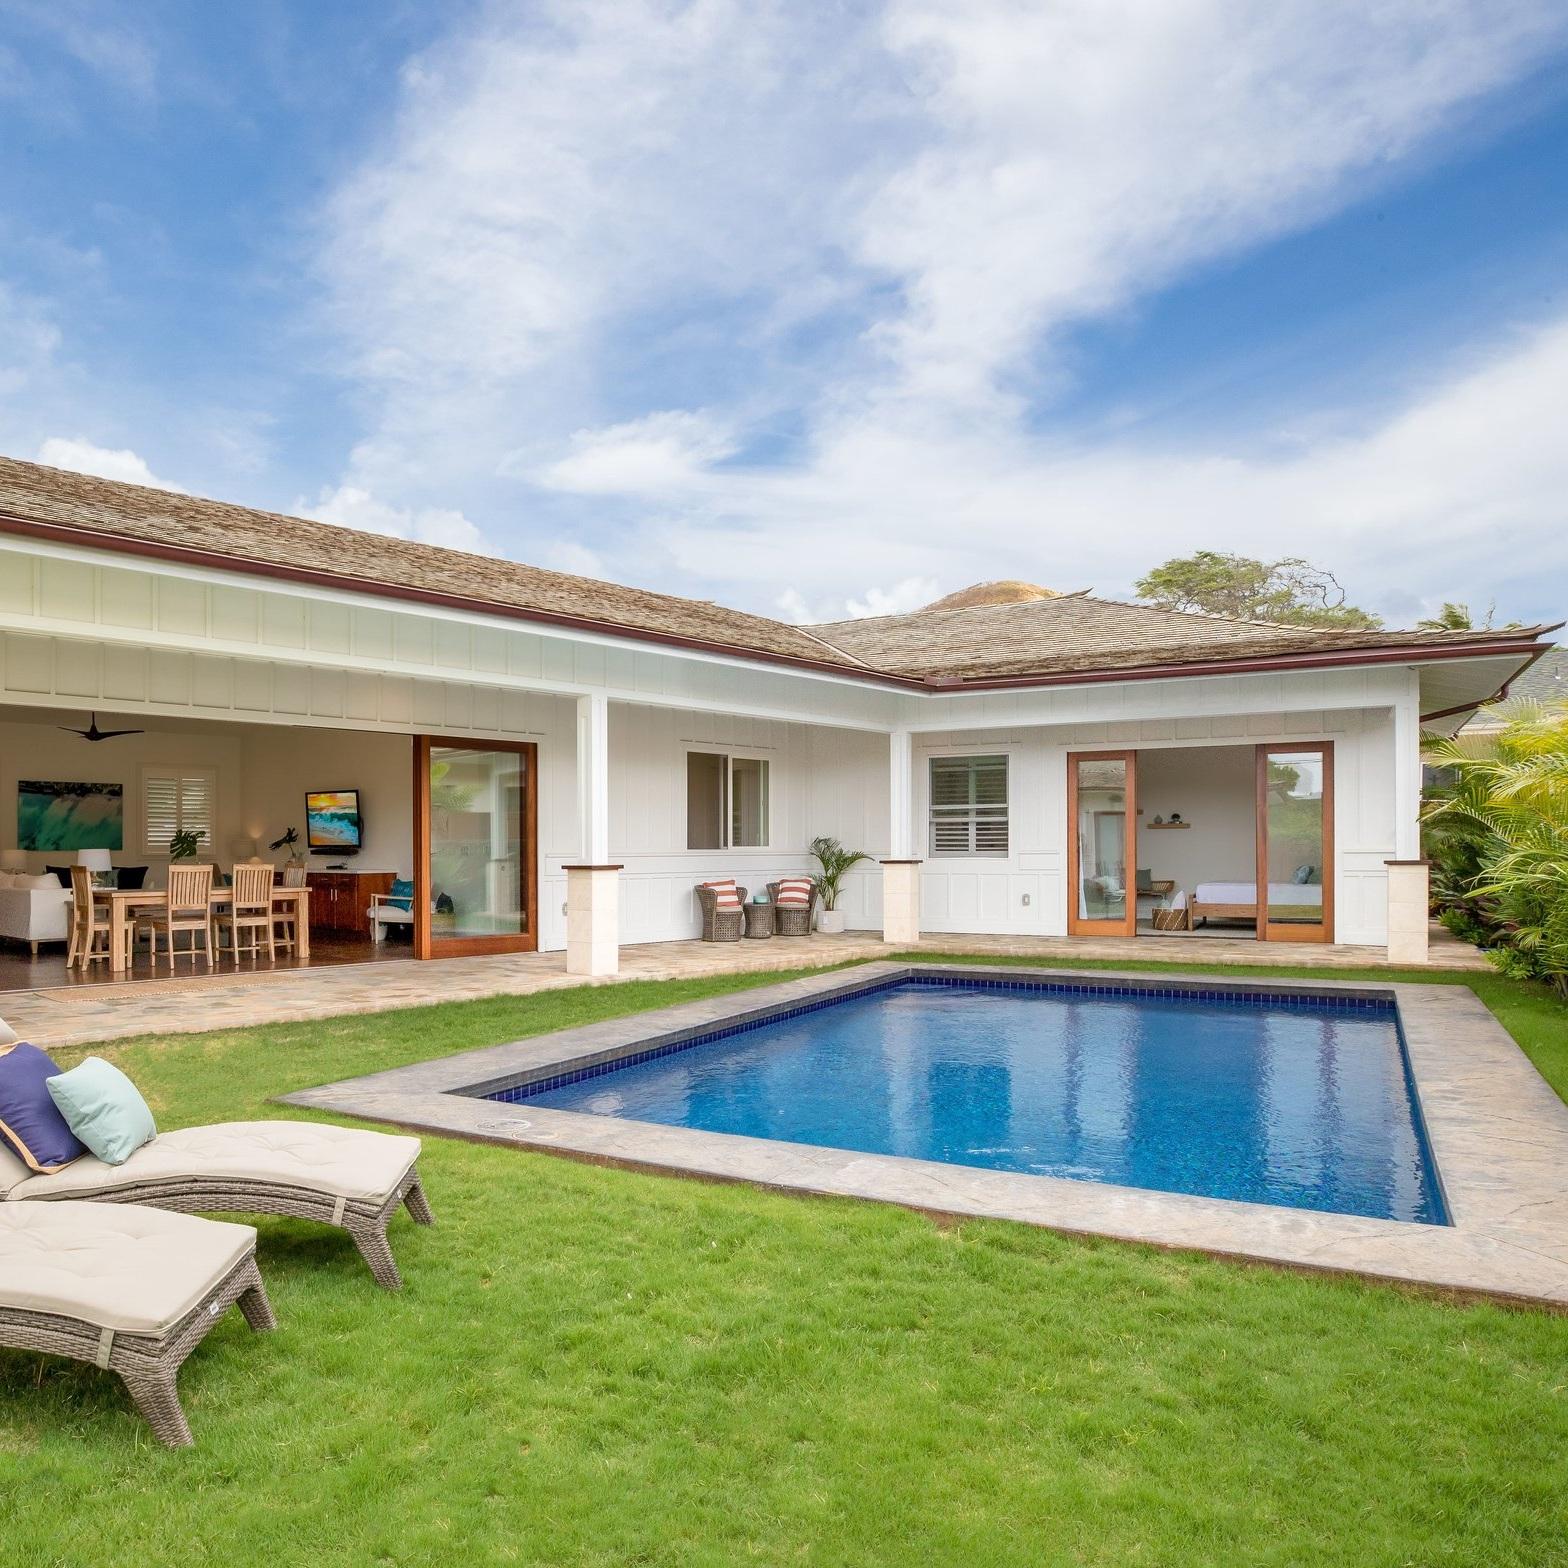 Lanikai Breeze - Lanikai, OahuMonthly Rates starting at $15,0003 Bedrooms2 Bathrooms